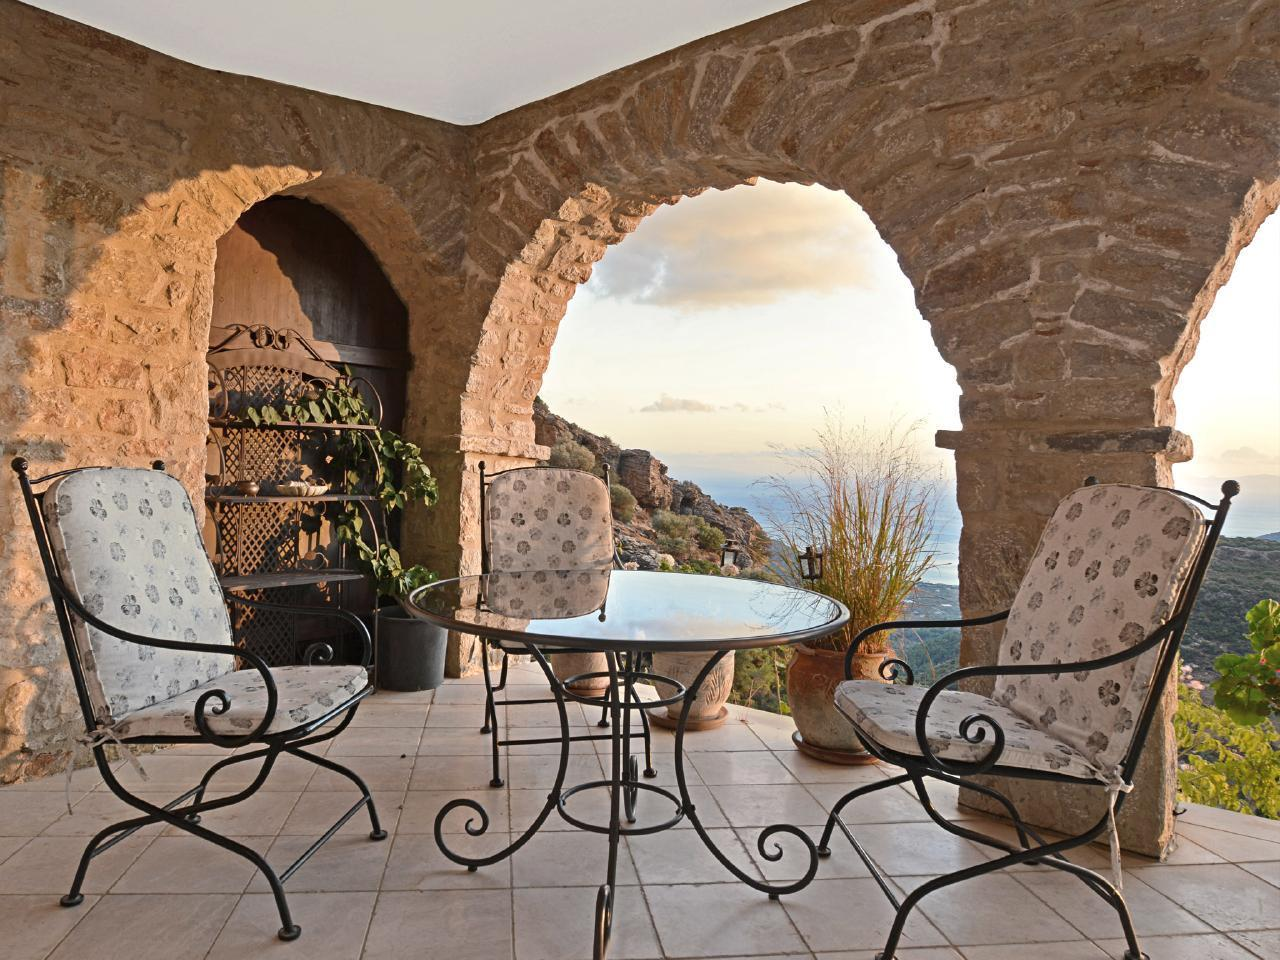 Maison de vacances Exklusives Chalet, romantisch am Berghang und Meer gelegen (2506674), Mesudiye, , Région Egéenne, Turquie, image 20